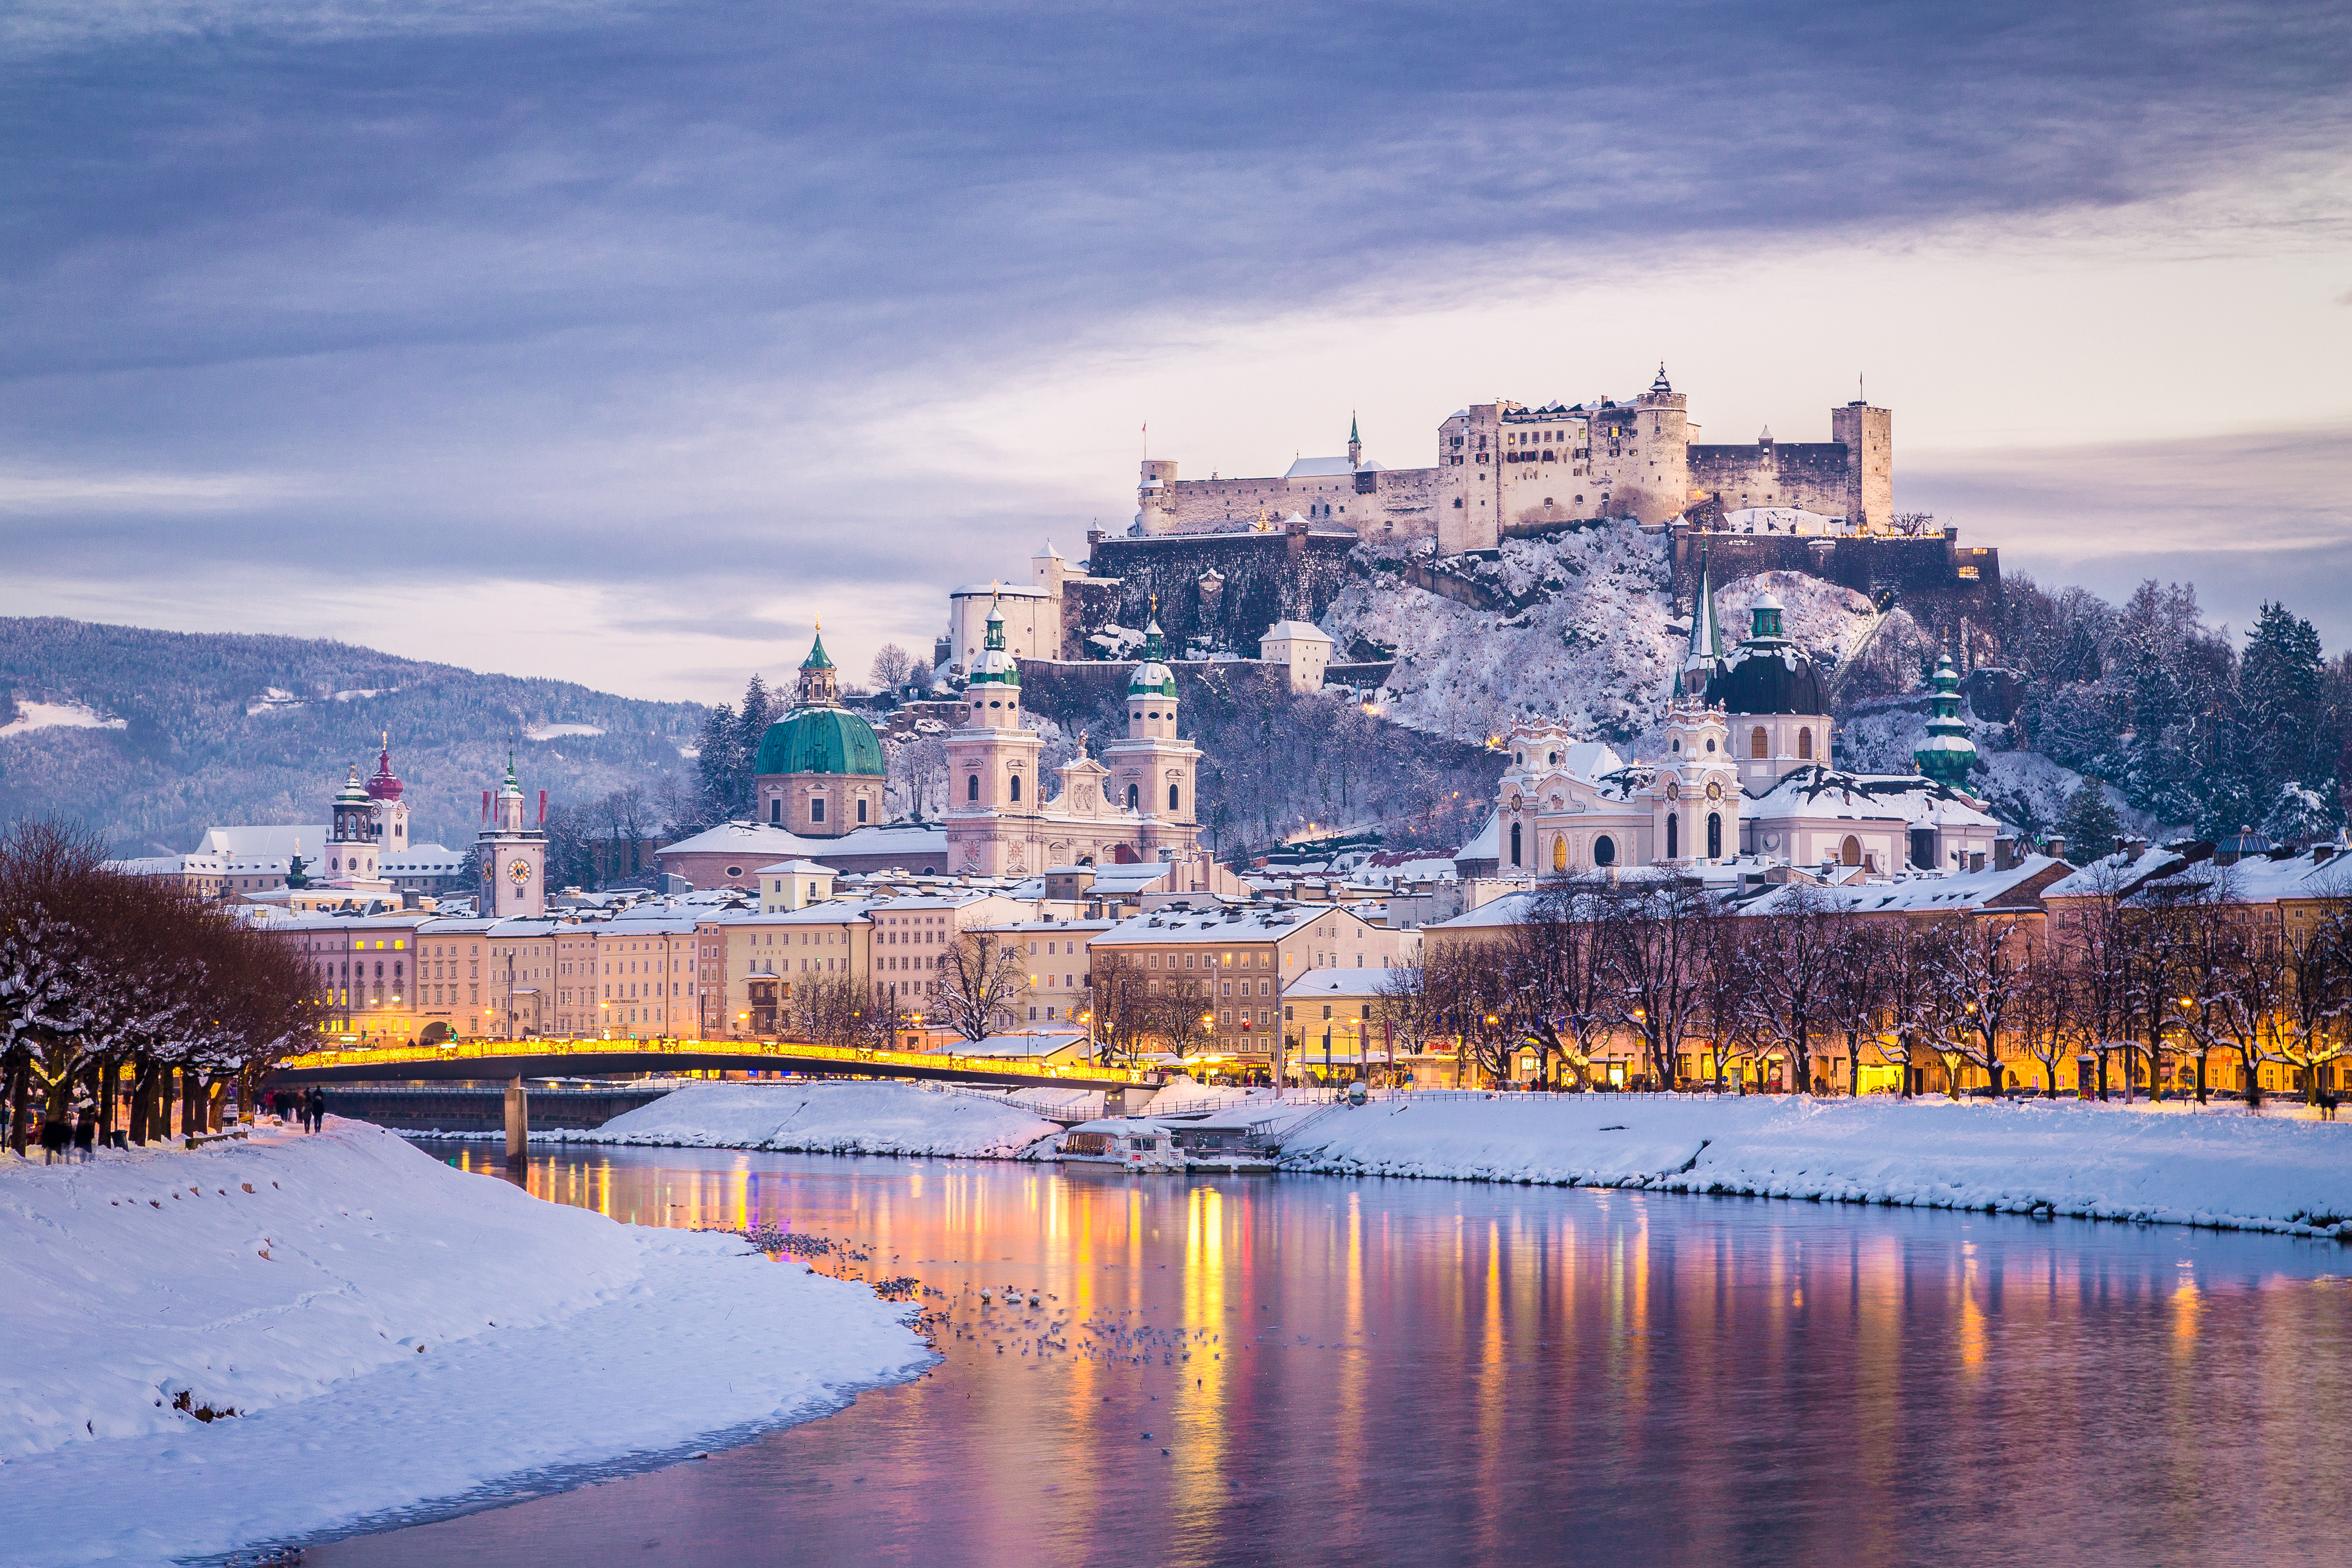 Austrian Lake District Linz Salzburg Christmas Markets